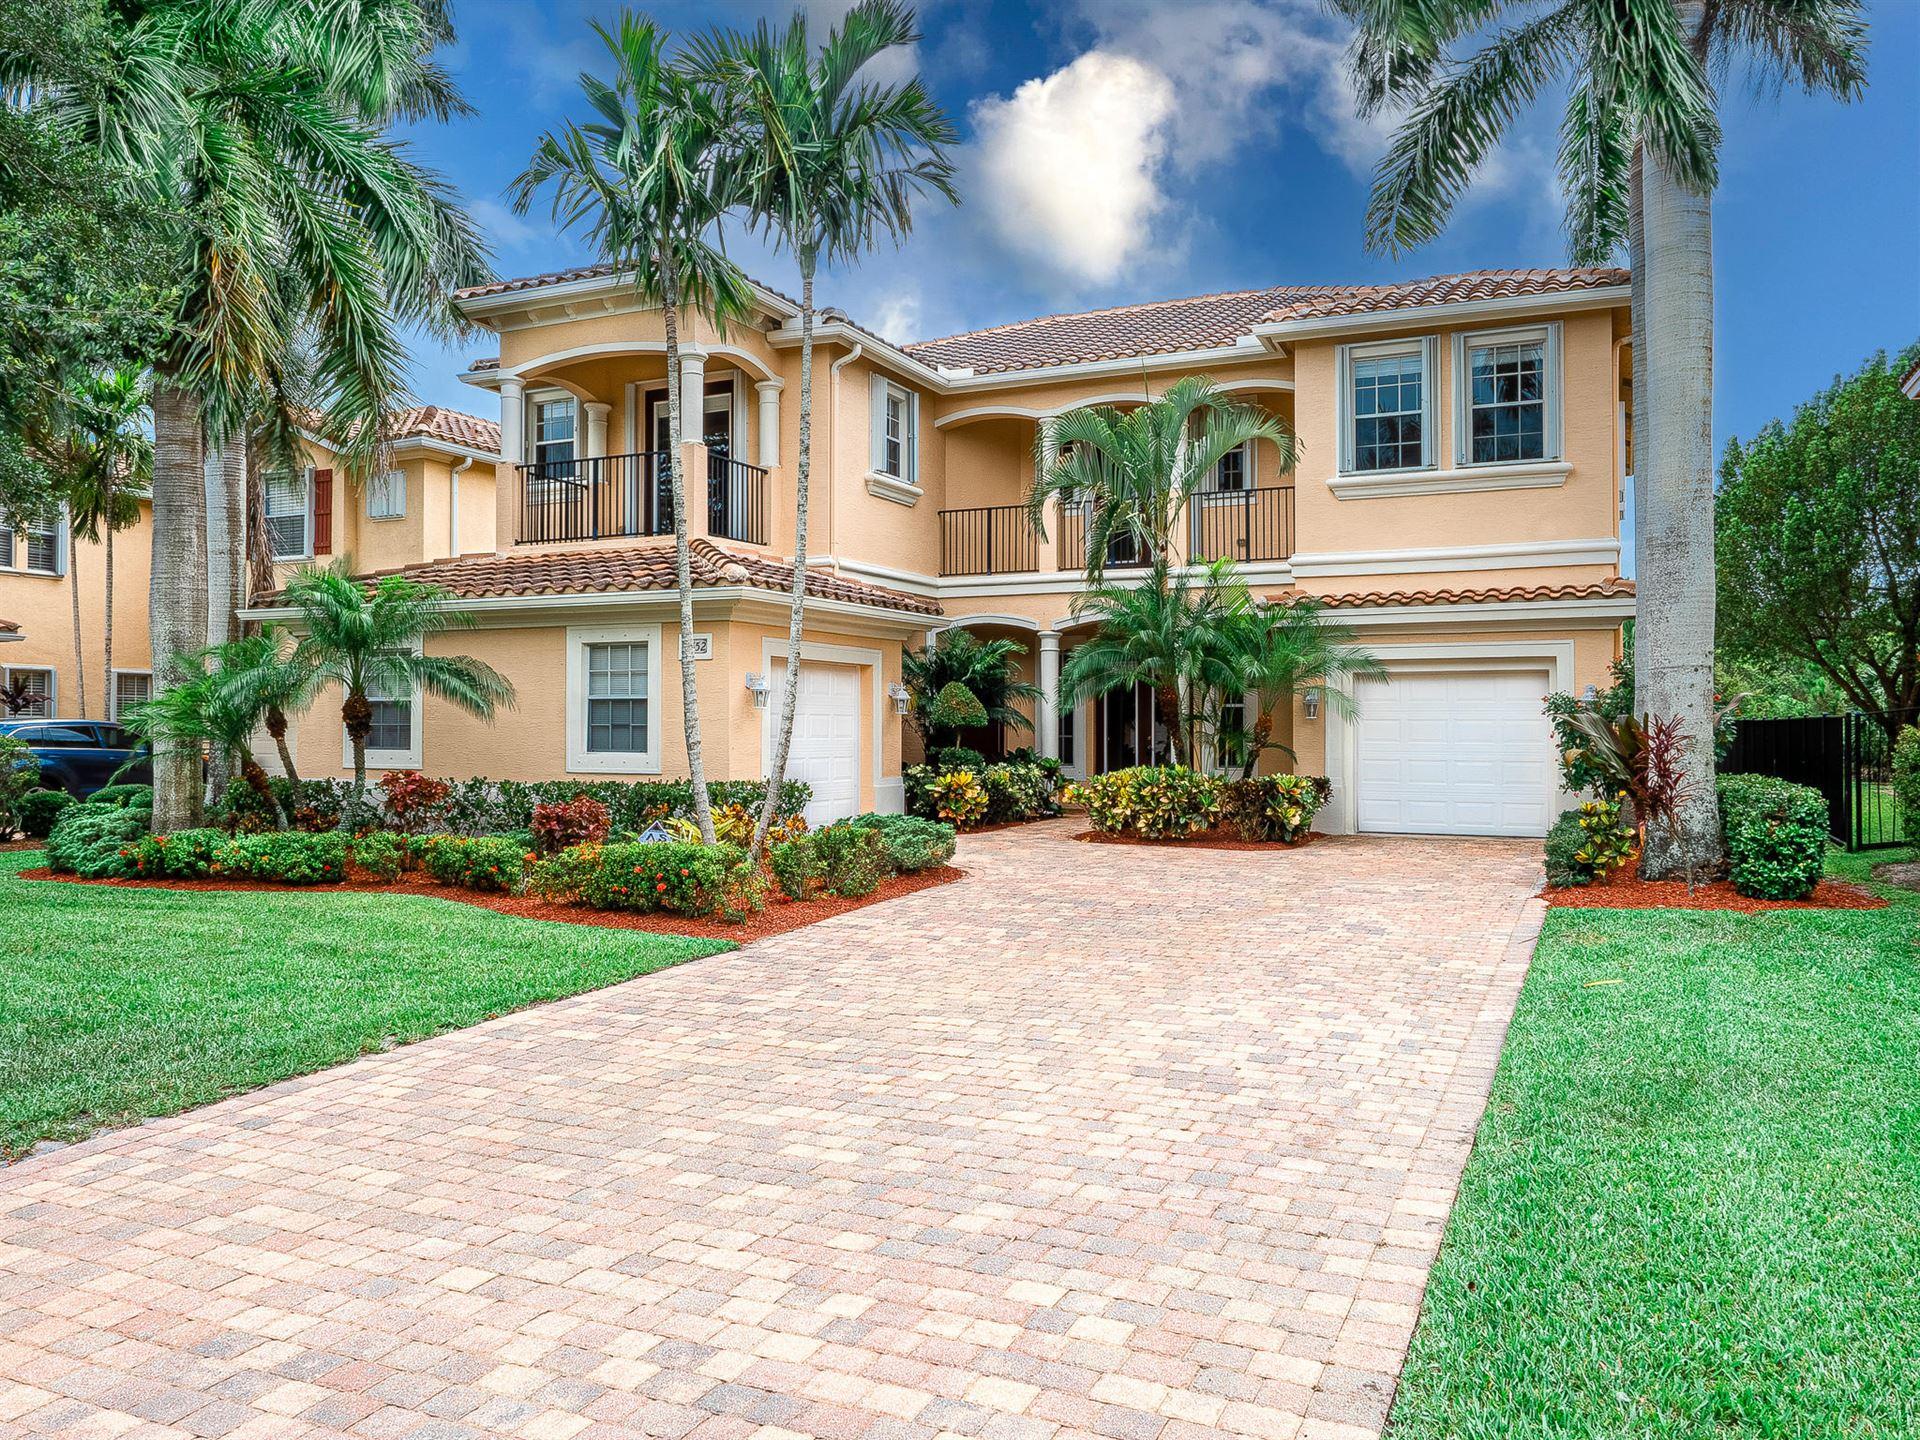 Photo of 5552 SW Bellflower Court, Palm City, FL 34990 (MLS # RX-10724912)